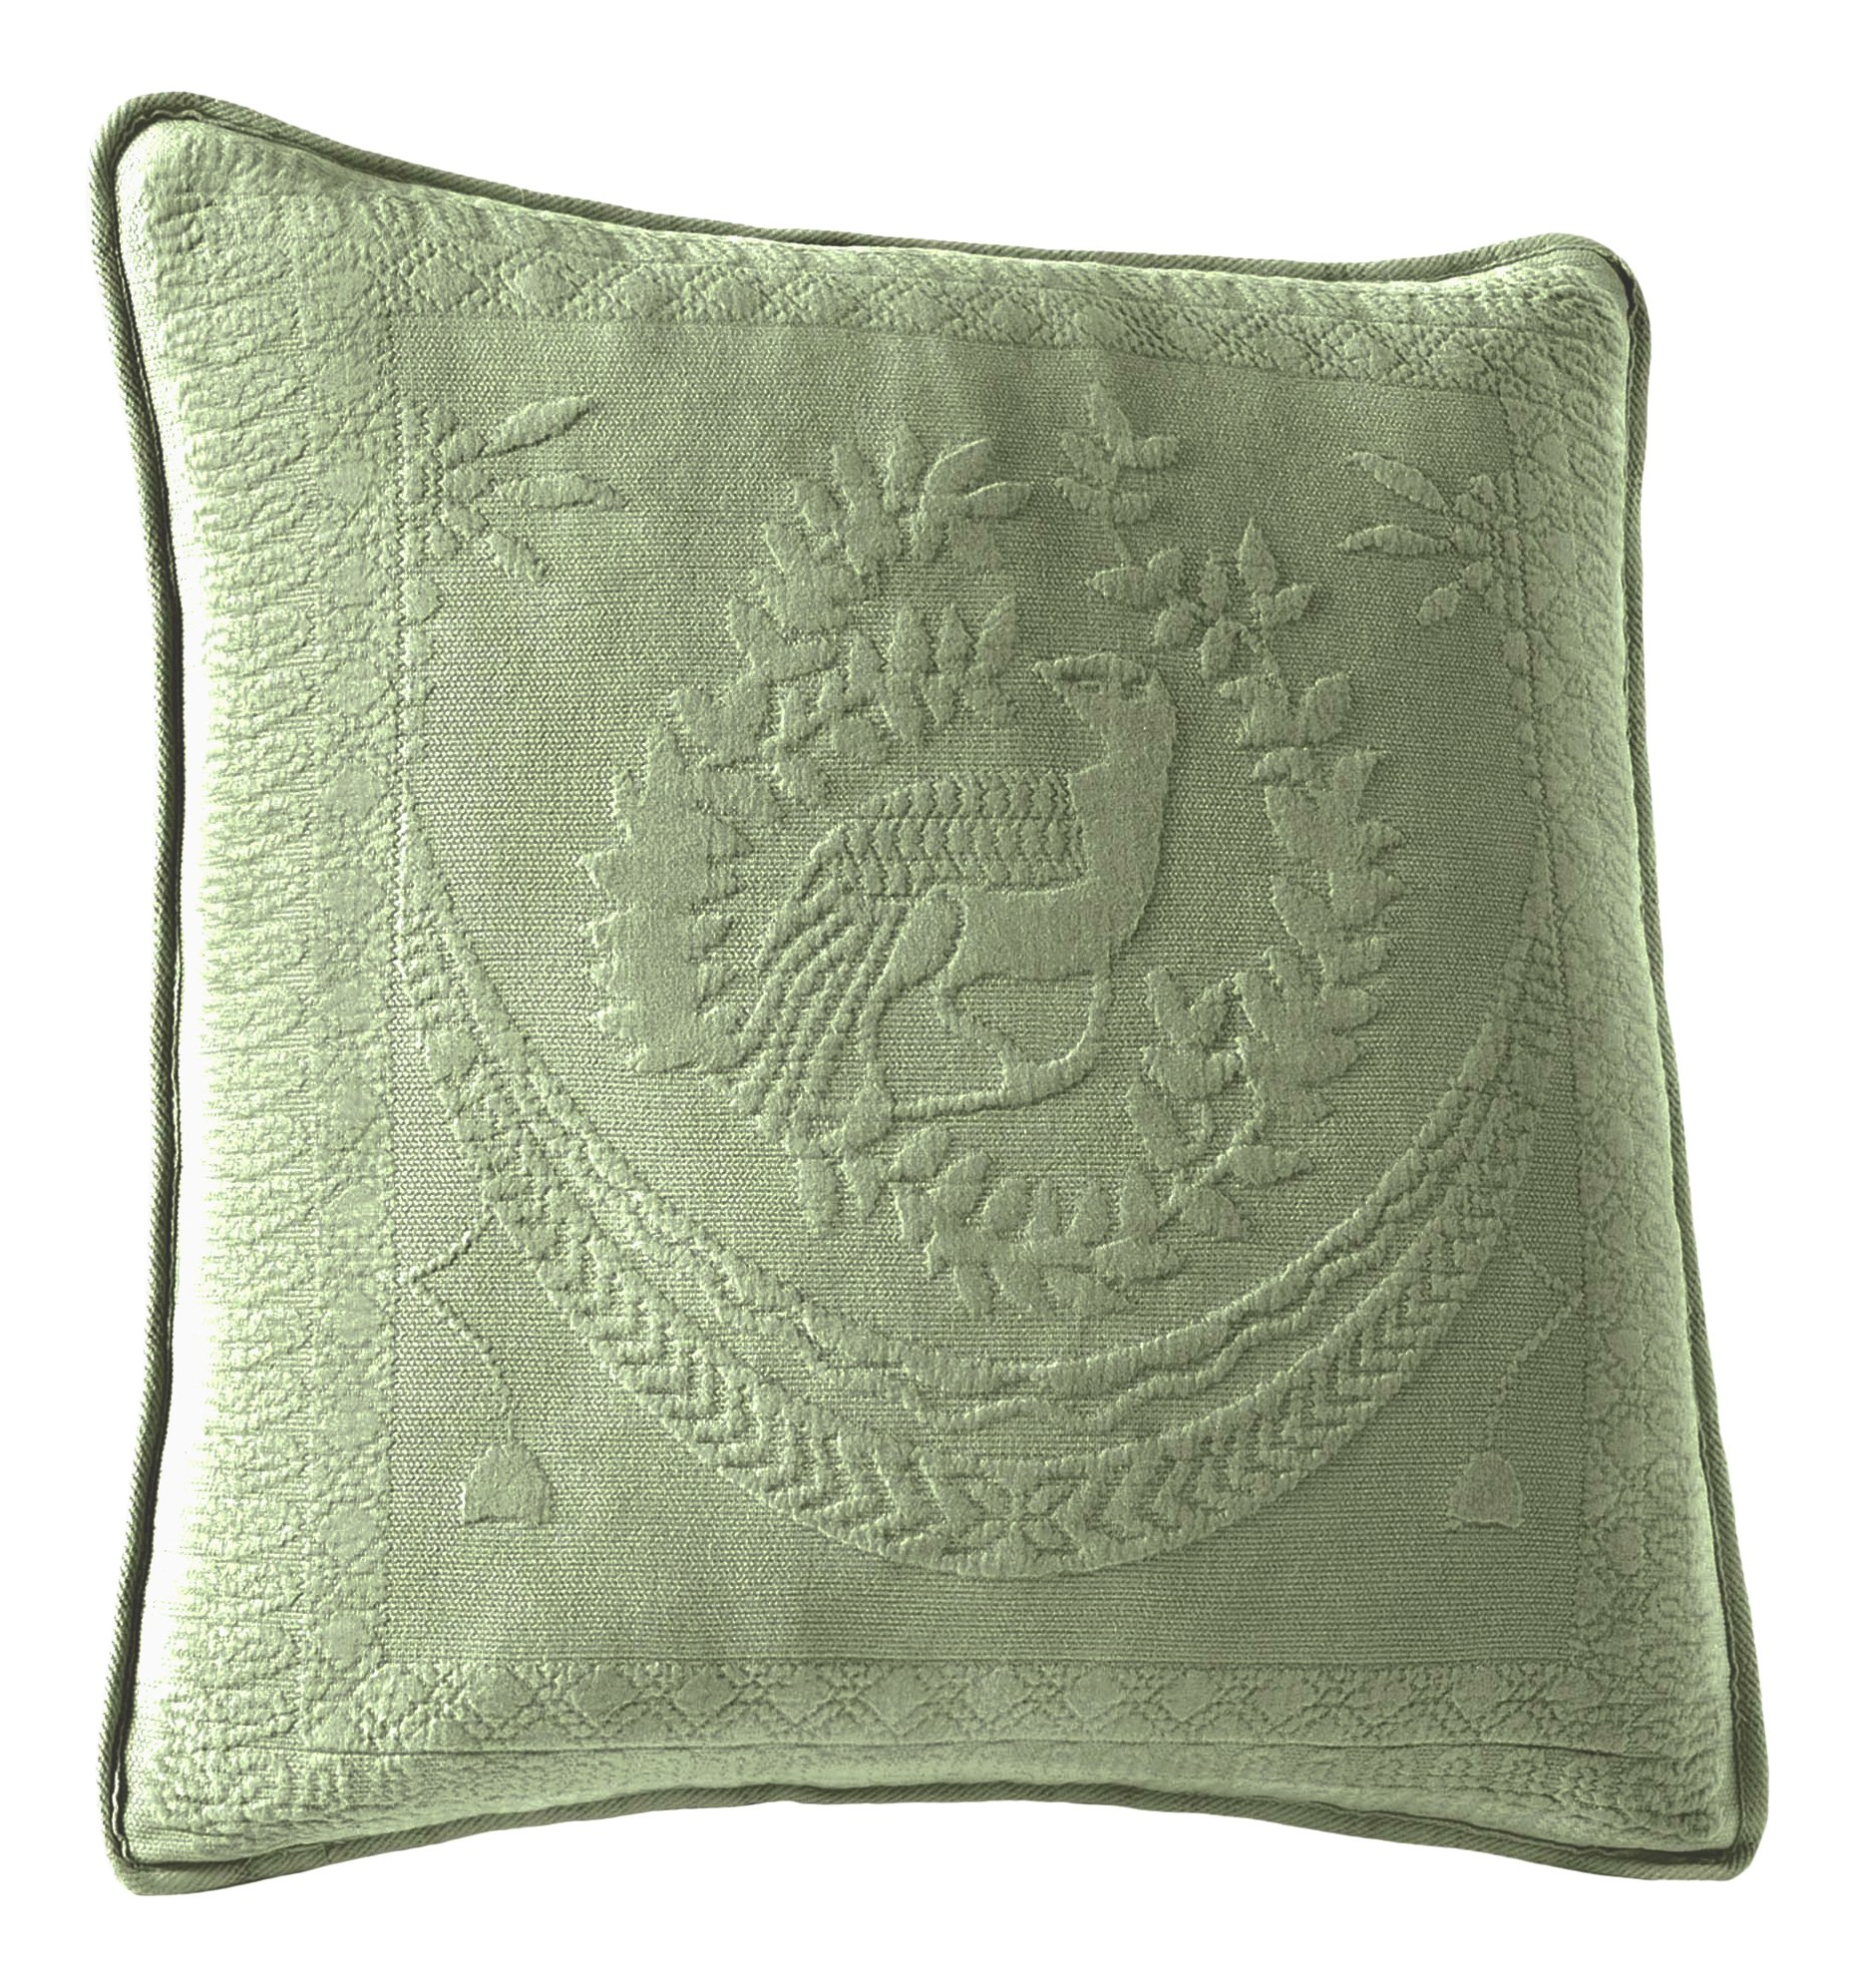 Historic Charleston 13995020X020SAG King Charles Matelasse 20-Inch by 20-Inch Decorative Pillow, Sage